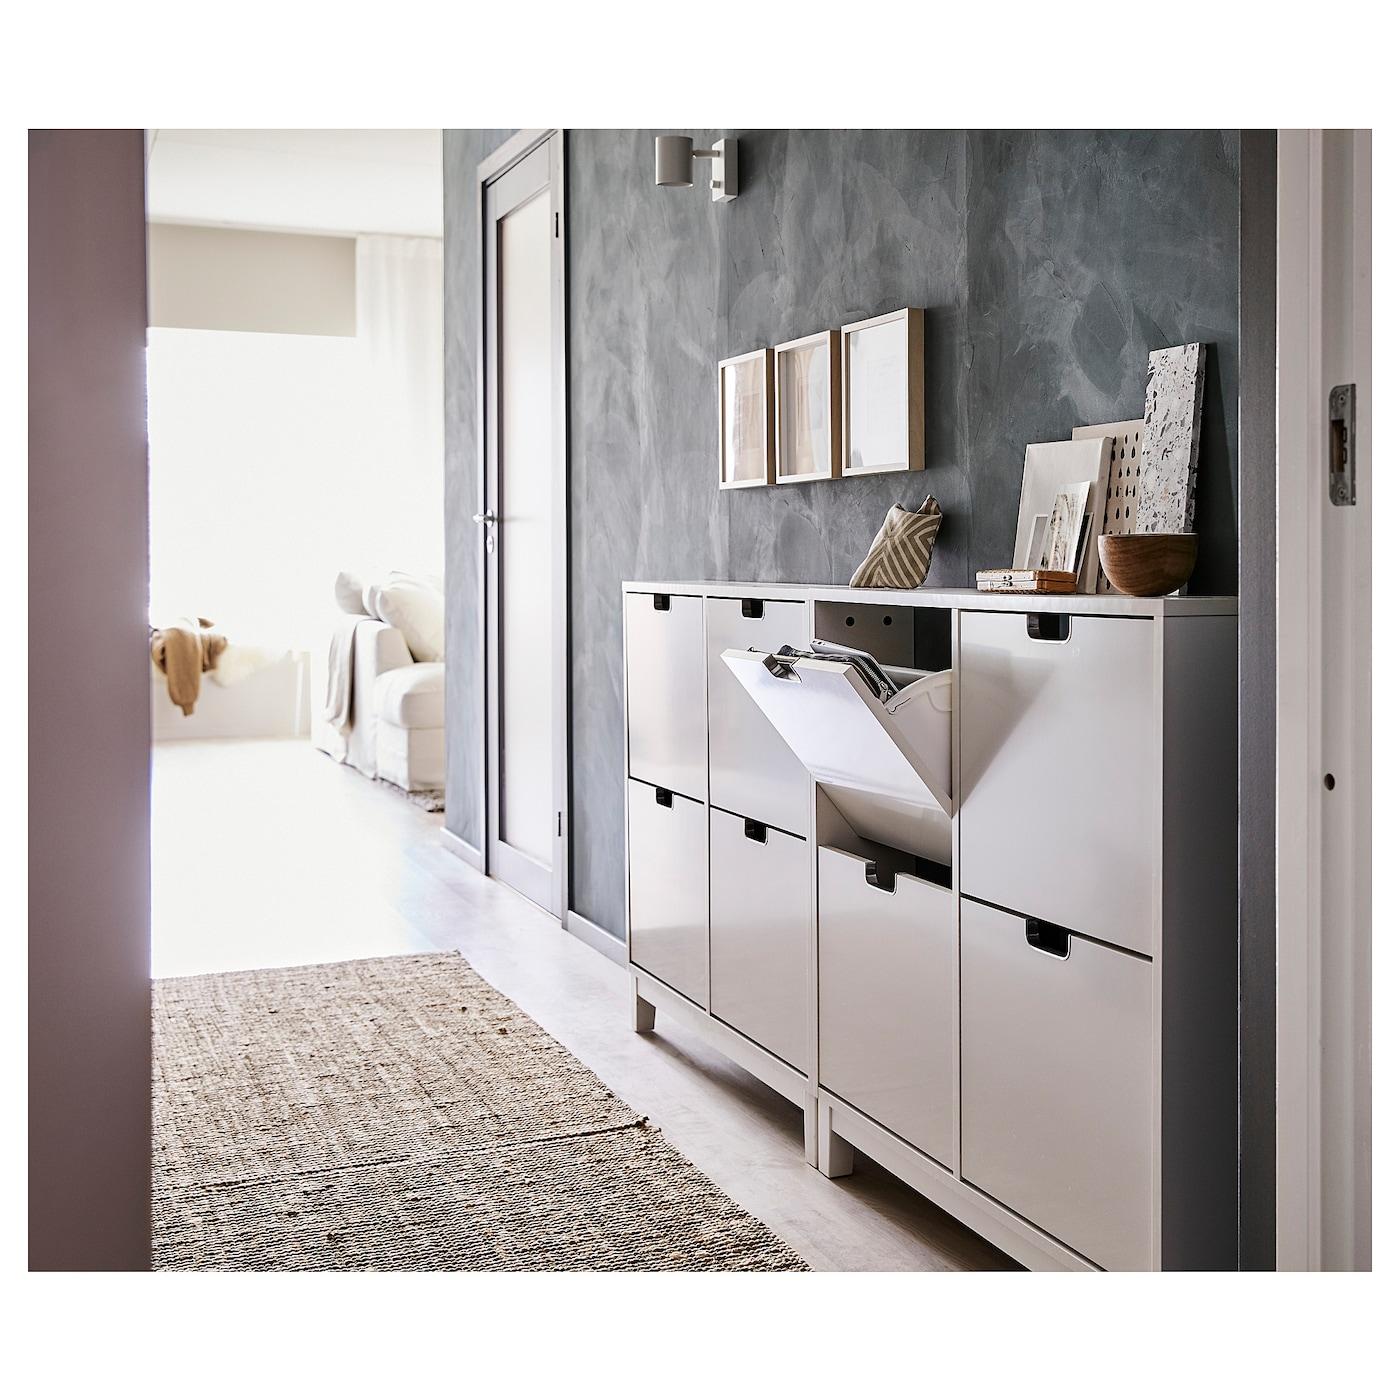 st ll range chaussures 4 casiers blanc 96 x 90 cm ikea. Black Bedroom Furniture Sets. Home Design Ideas